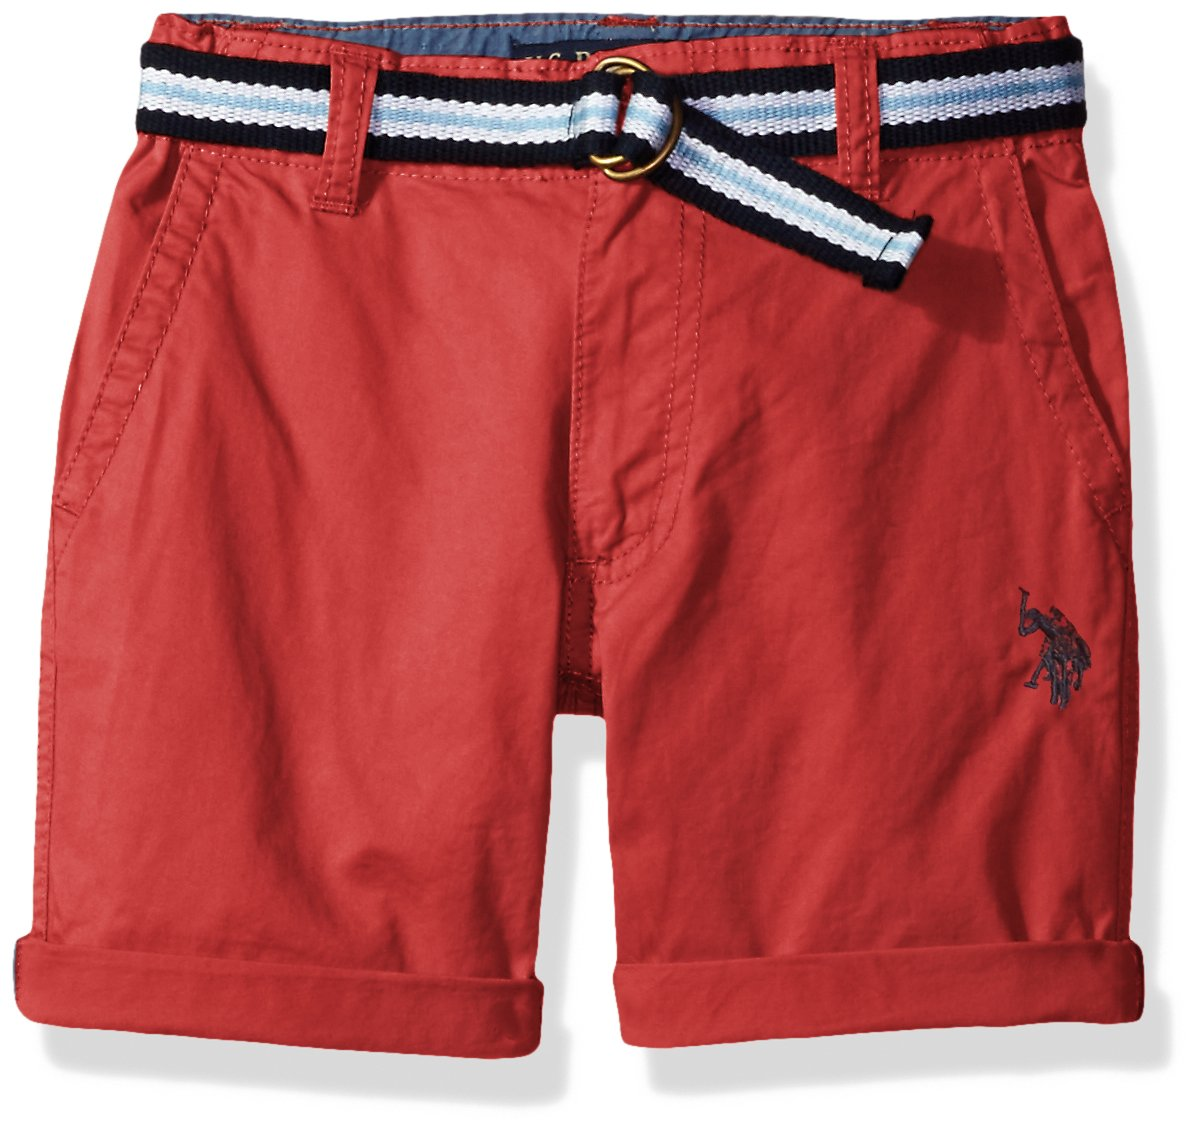 U.S. Polo Assn.. Little Boys' Fine Line Twill Short with Belt, Nantucket Red, 5